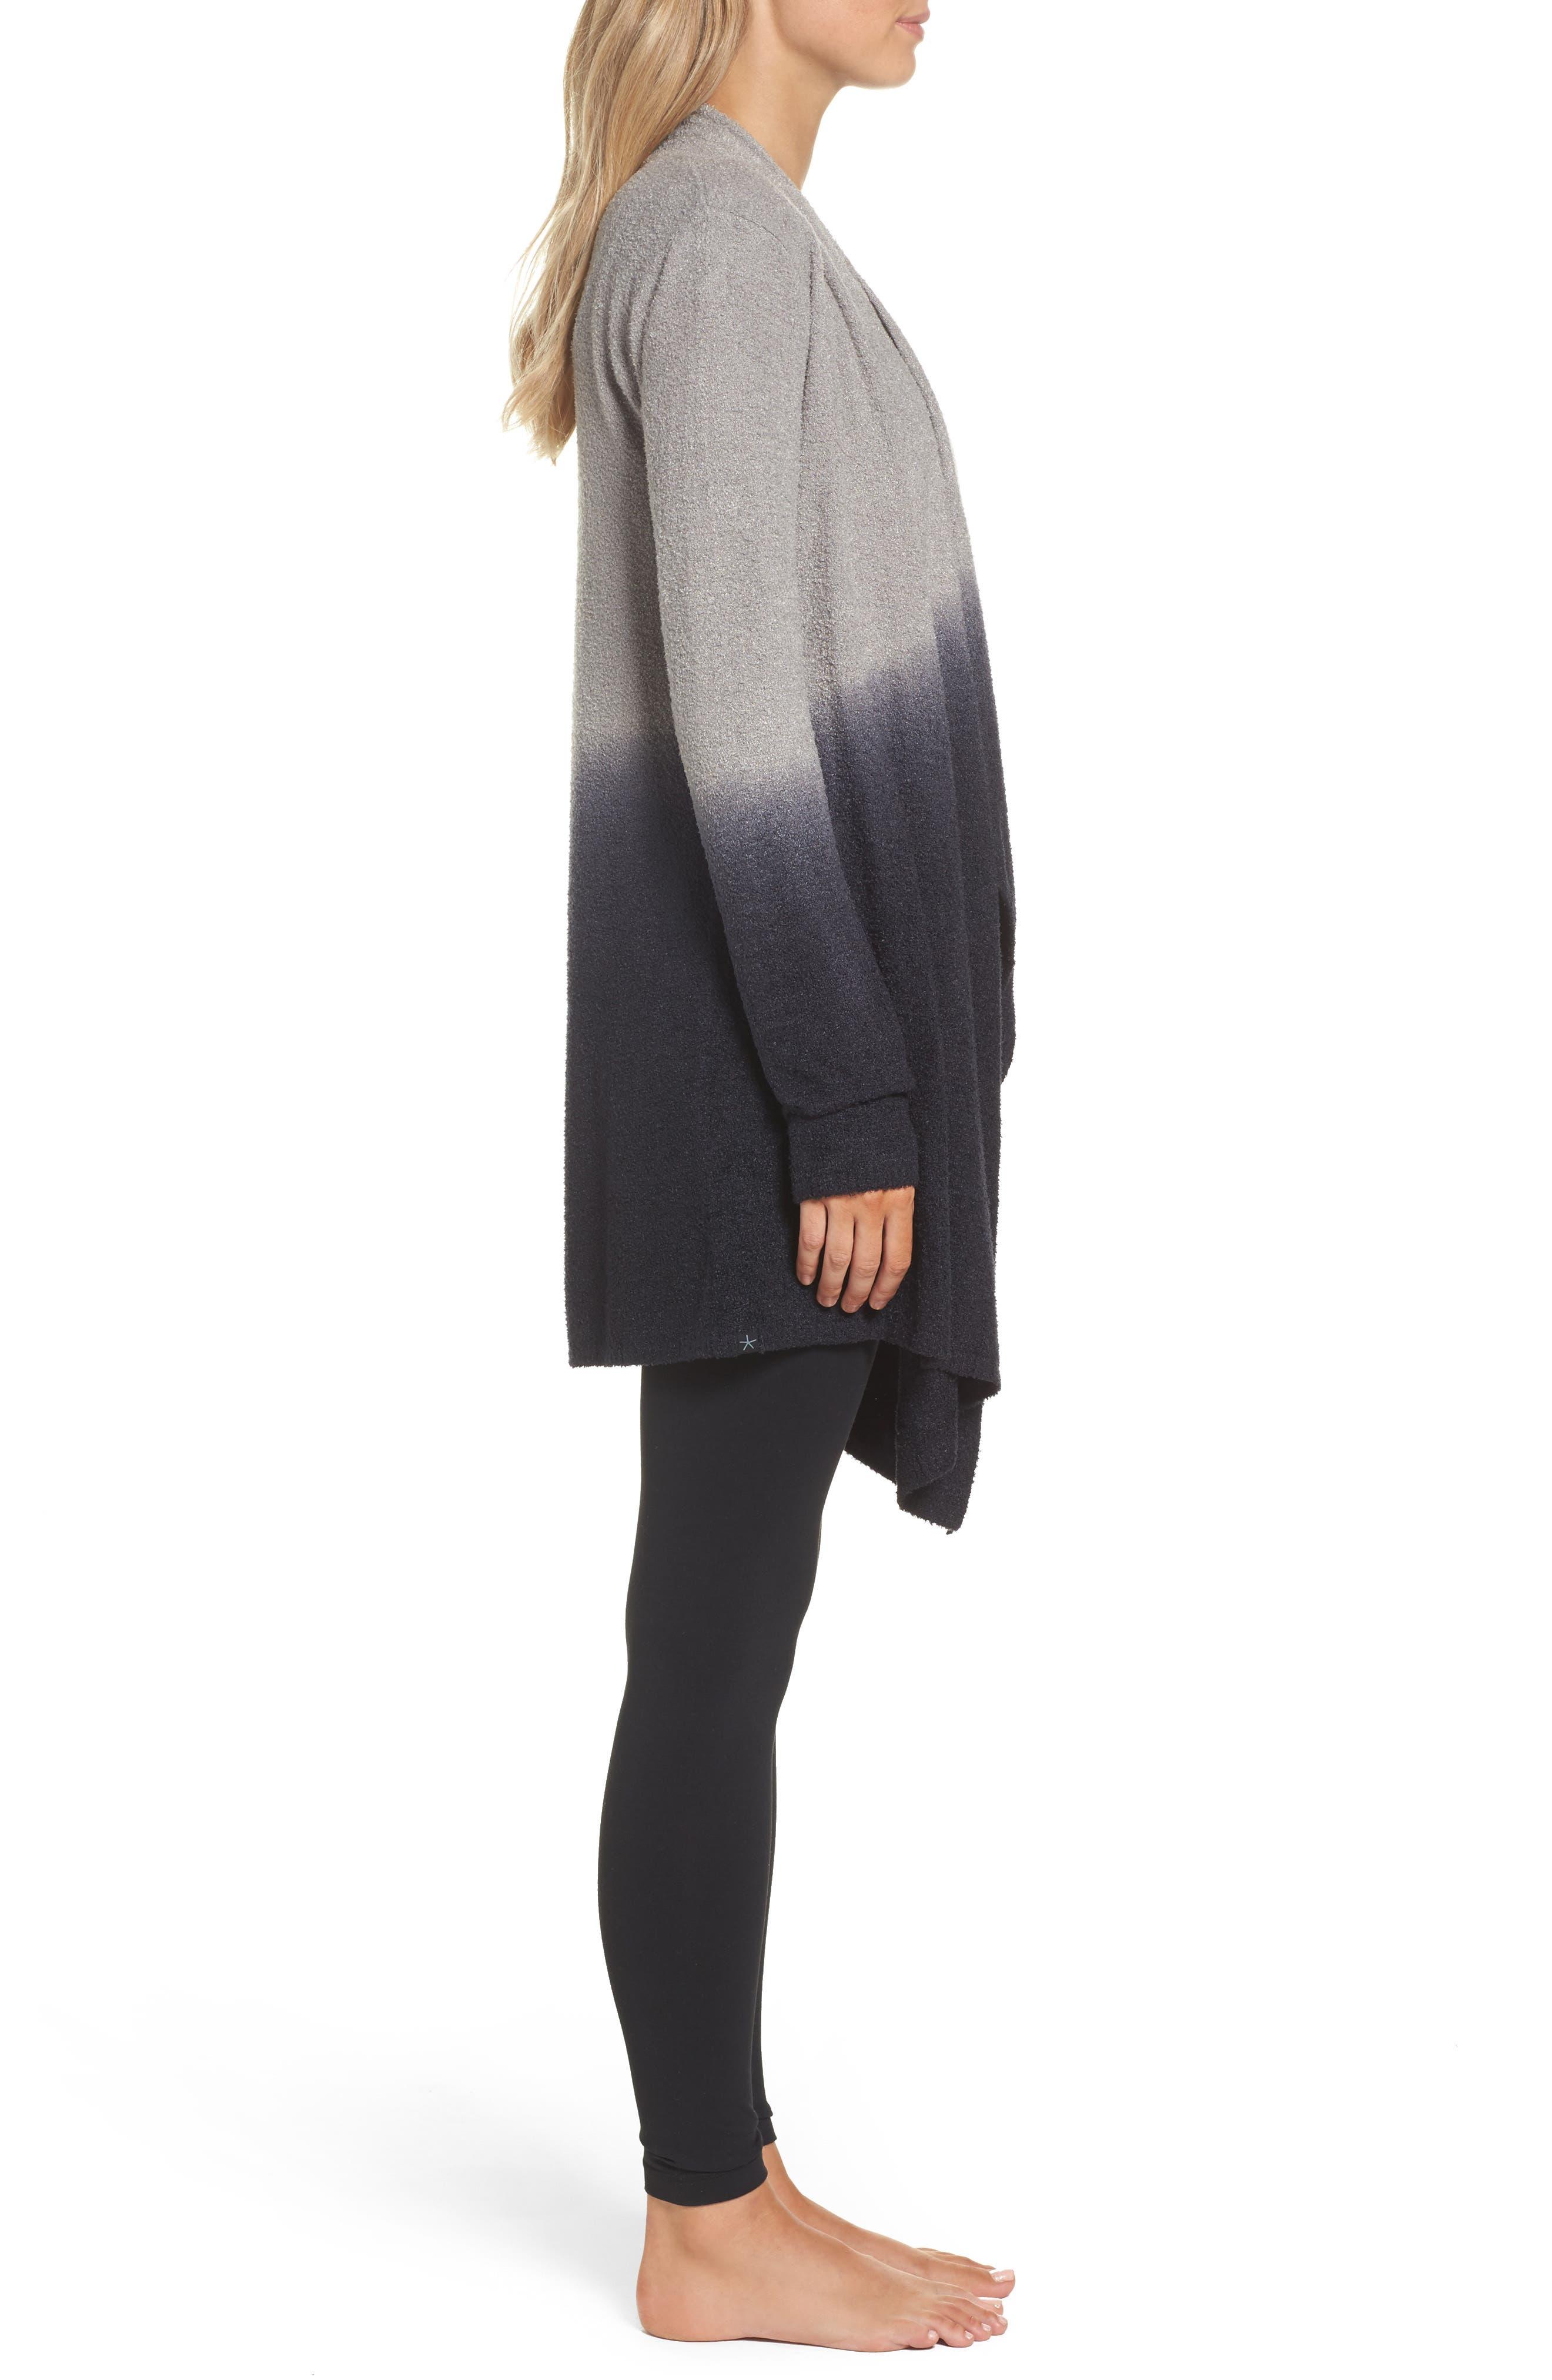 Alternate Image 3  - Barefoot Dreams® CozyChic Lite® Calypso Wrap Cardigan (Nordstrom Exclusive)